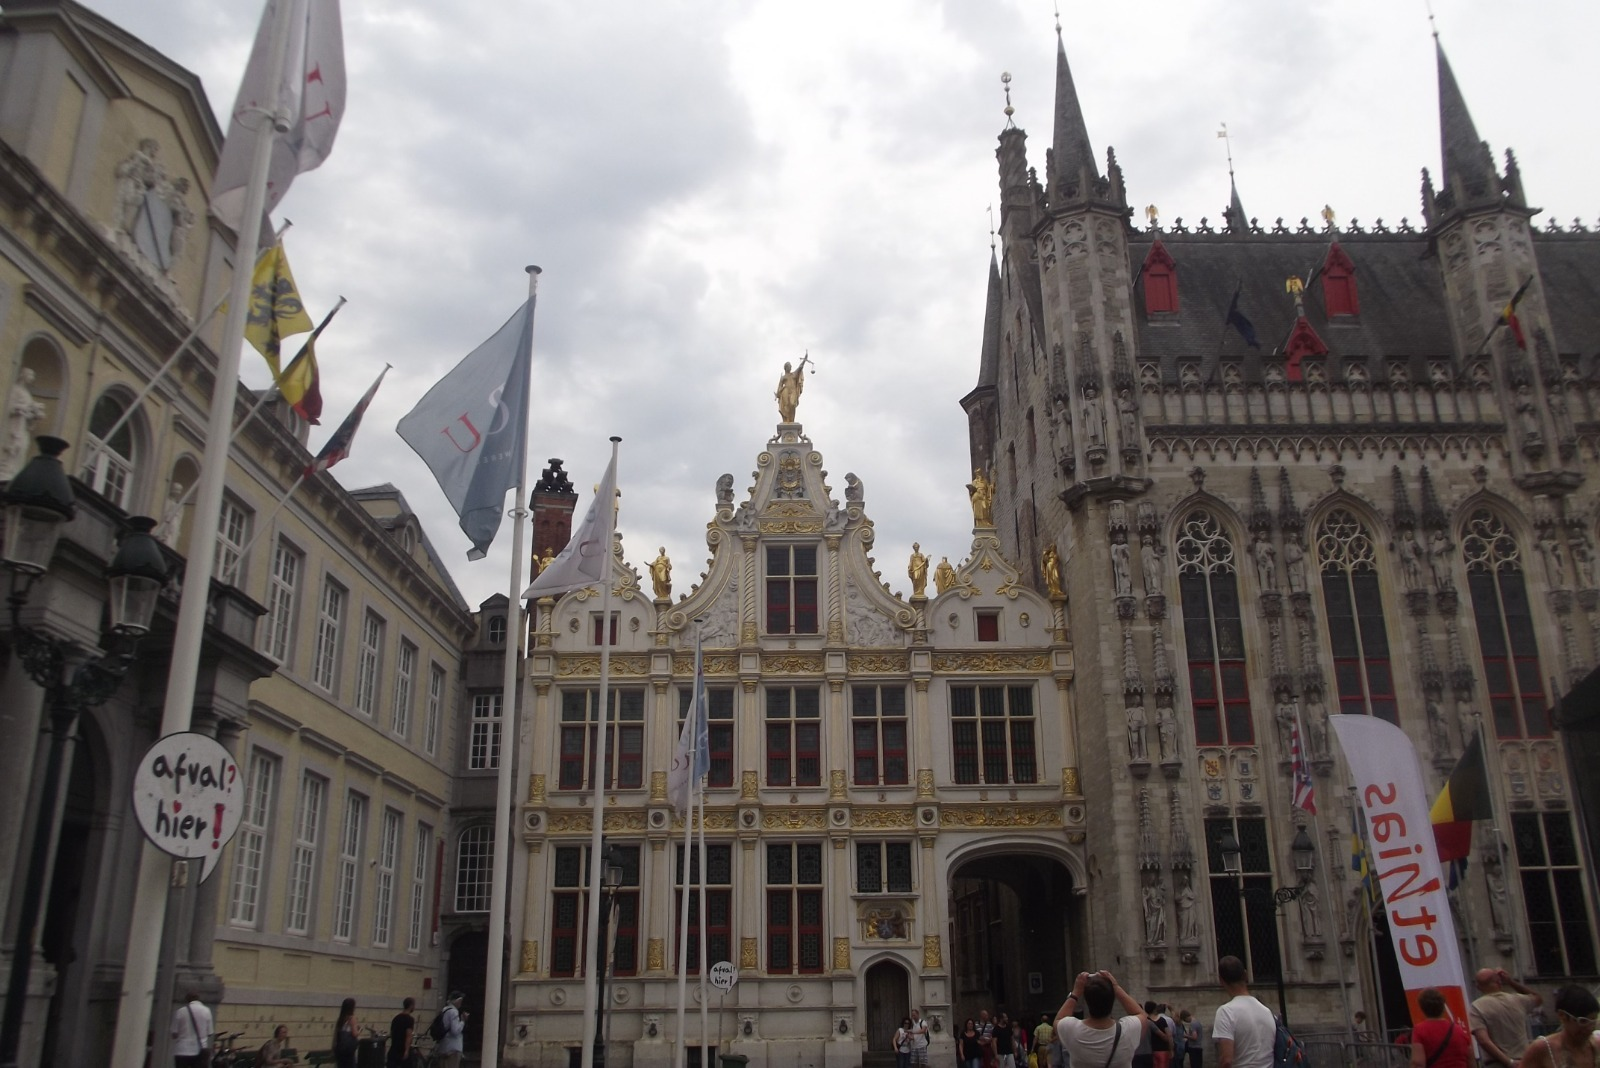 belgioelussemburgo32-1600418930.jpg